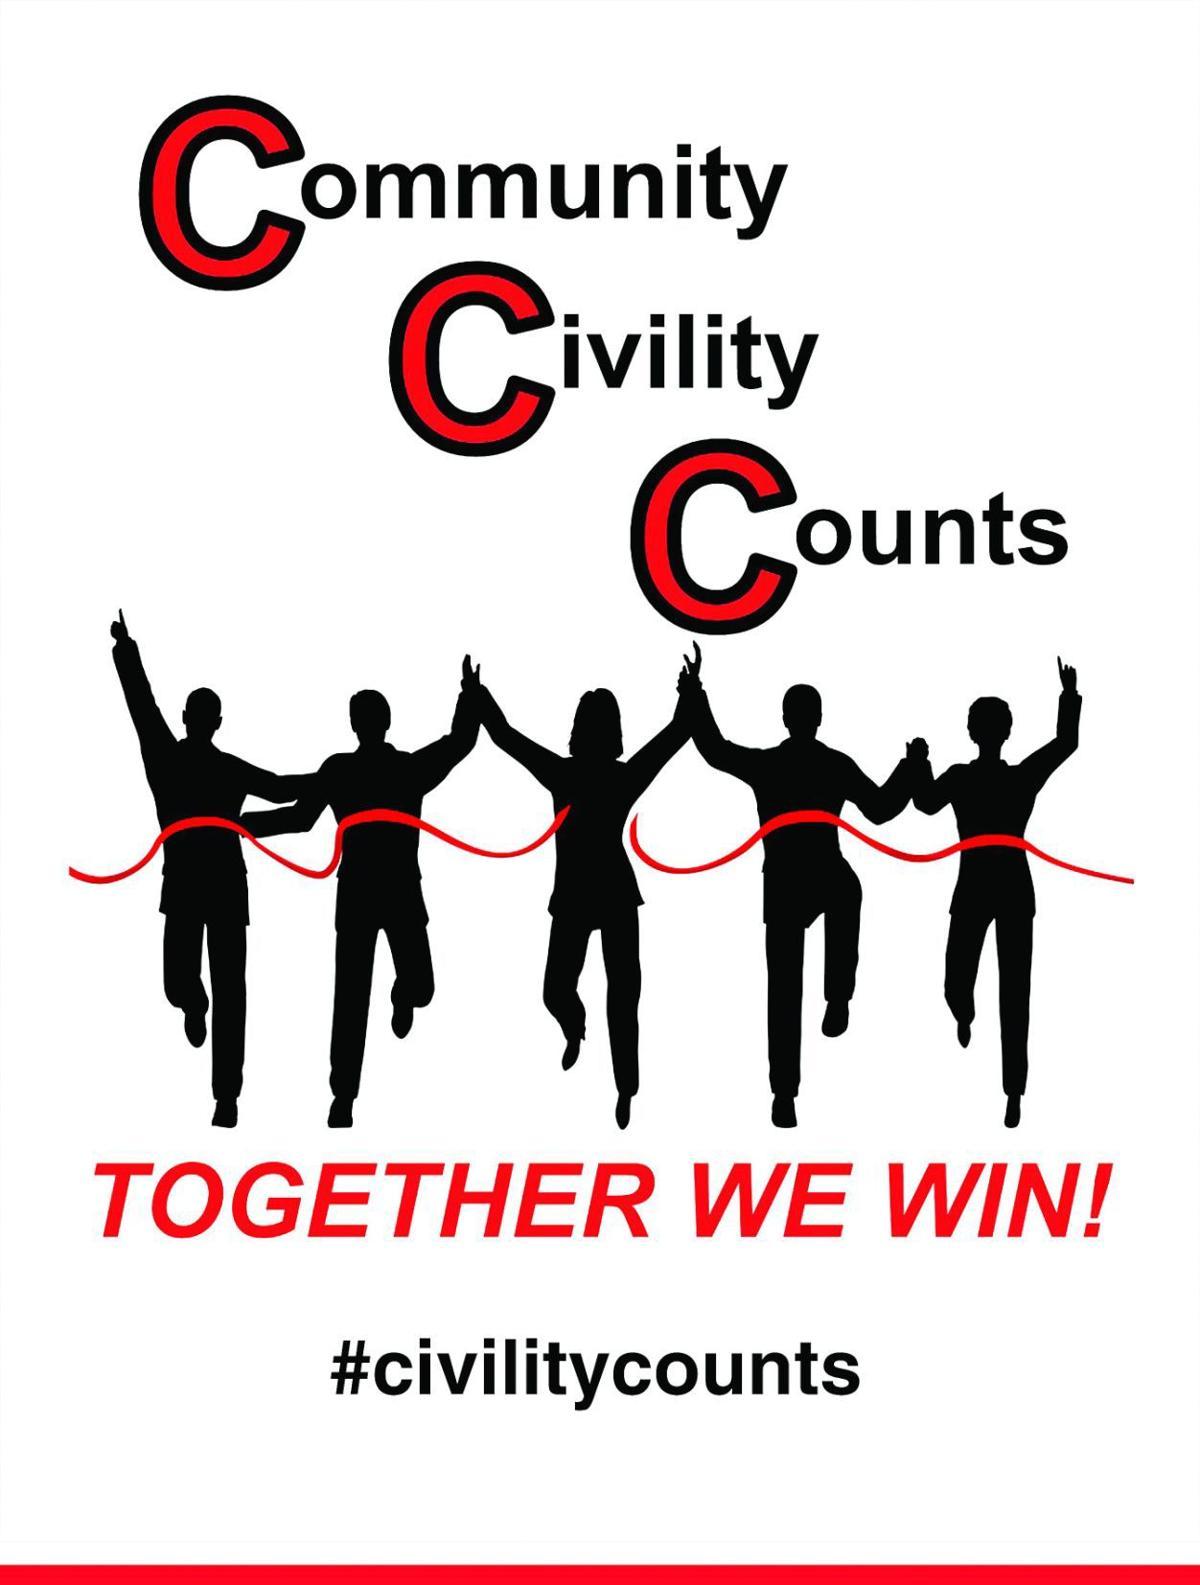 Community Civility Counts